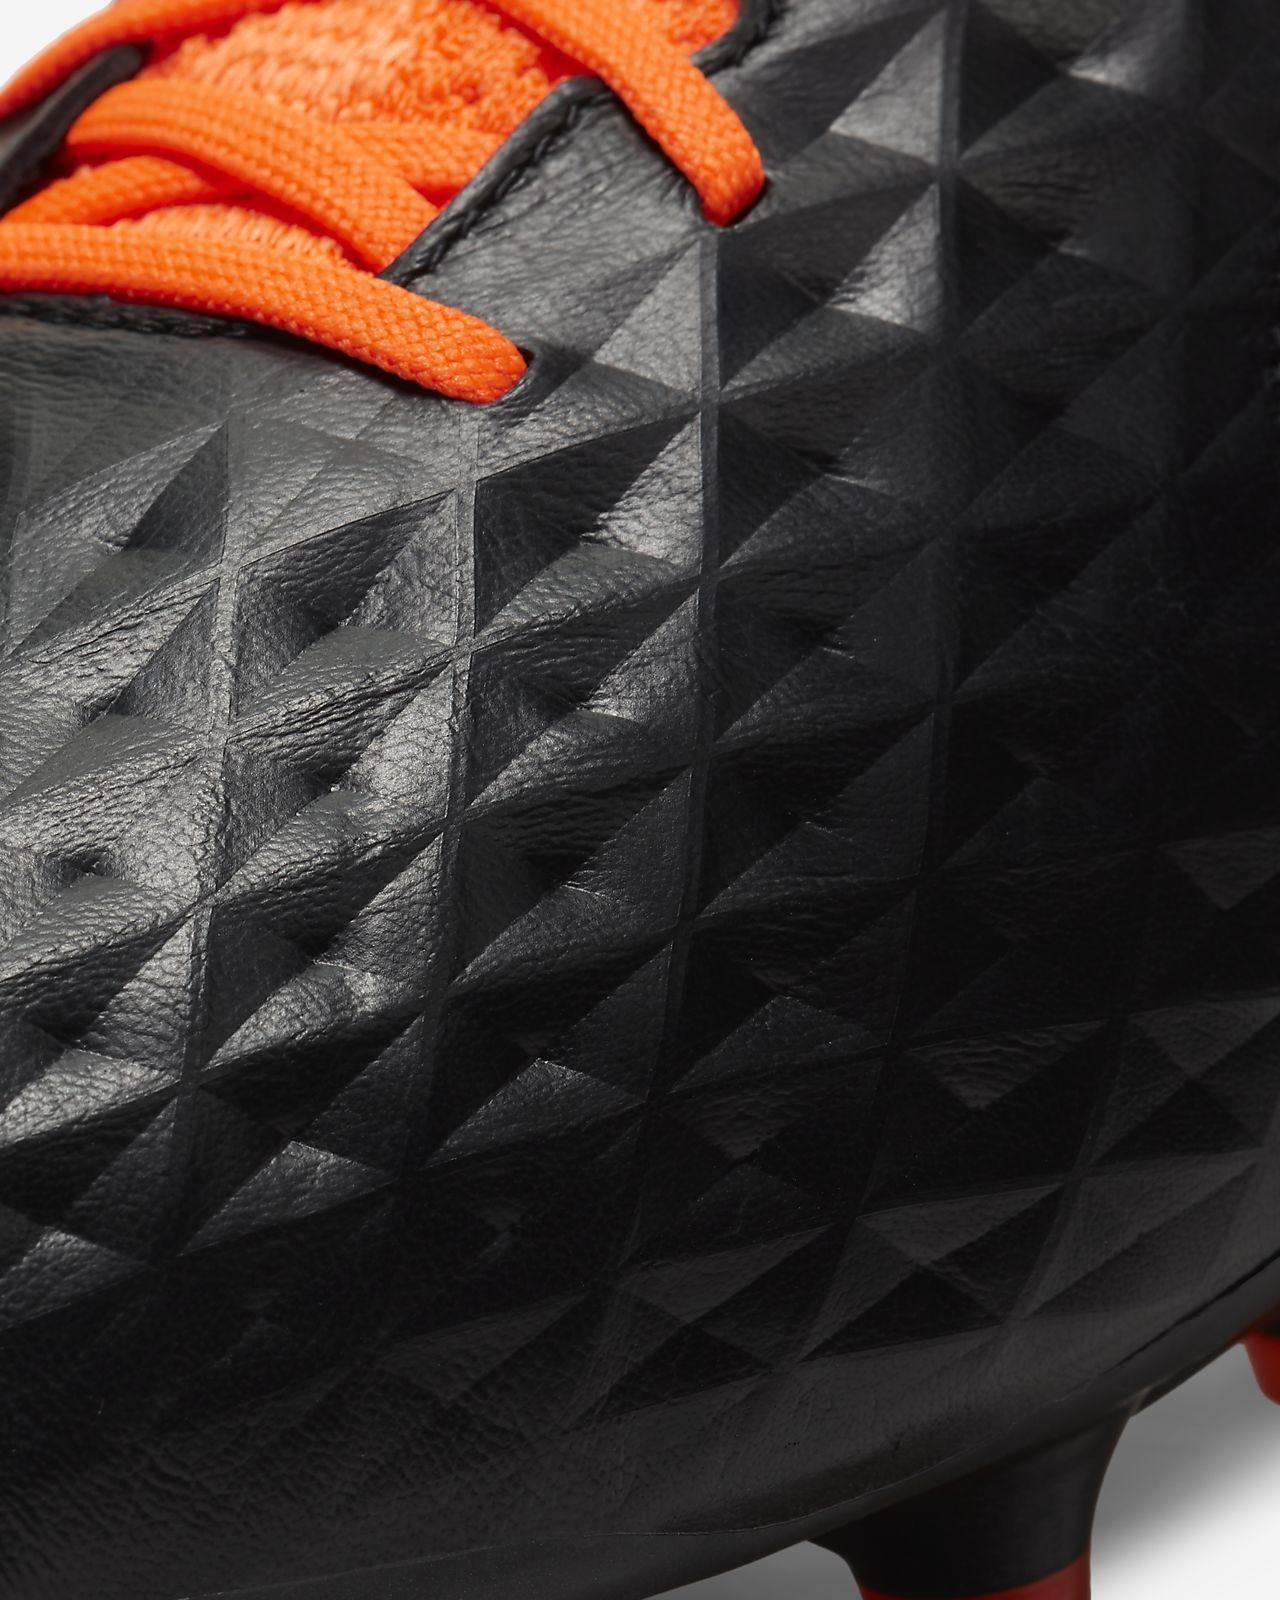 Nike Tiempo Legend 8 Elite FG Firm Ground Football Boot